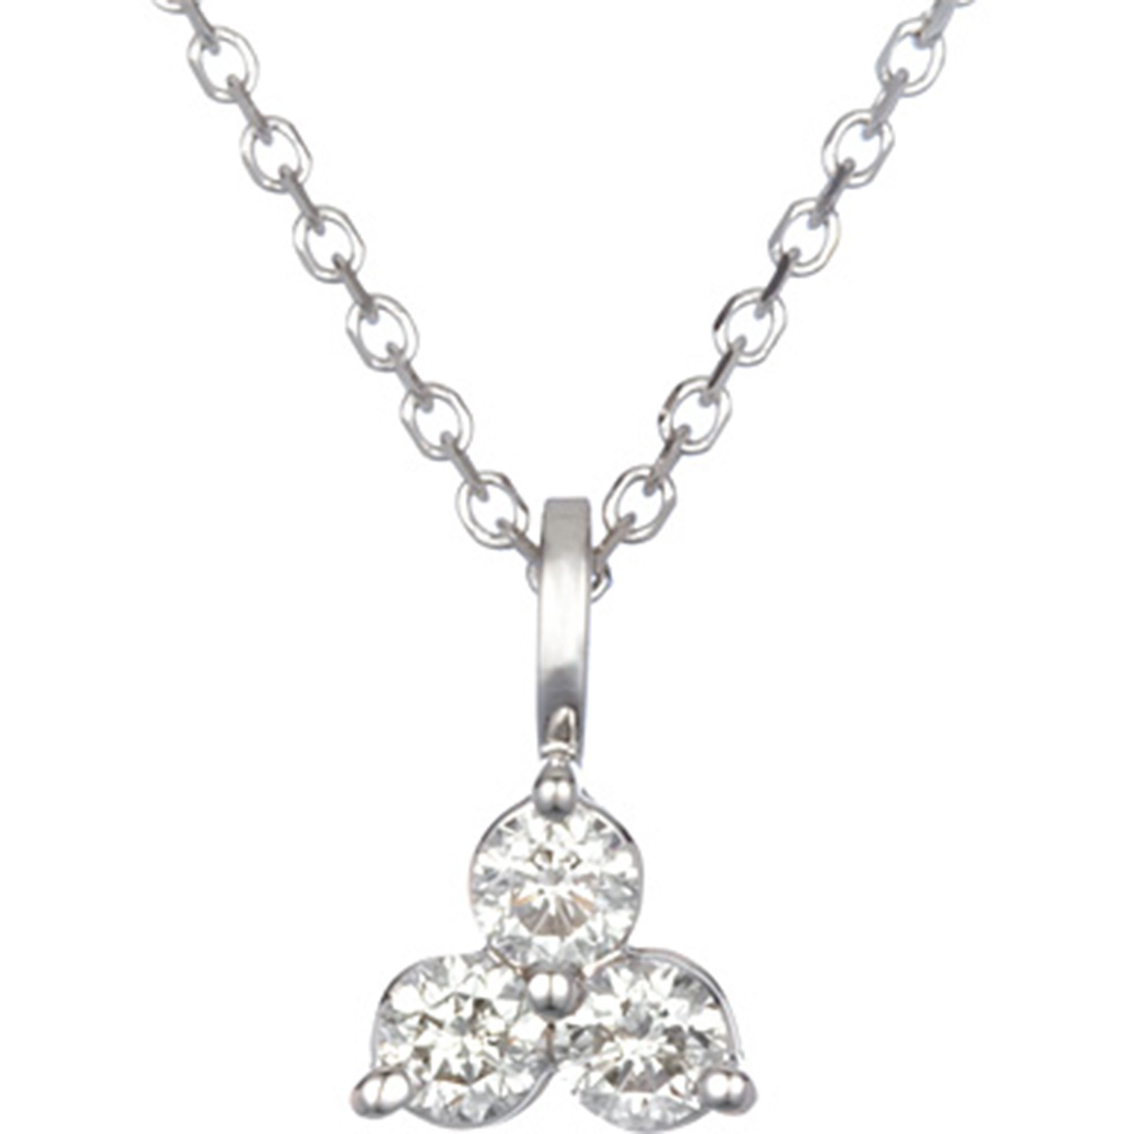 14k white gold 38 ctw triangle design 3 diamond pendant 3 stone 14k white gold 38 ctw triangle design 3 diamond pendant aloadofball Choice Image